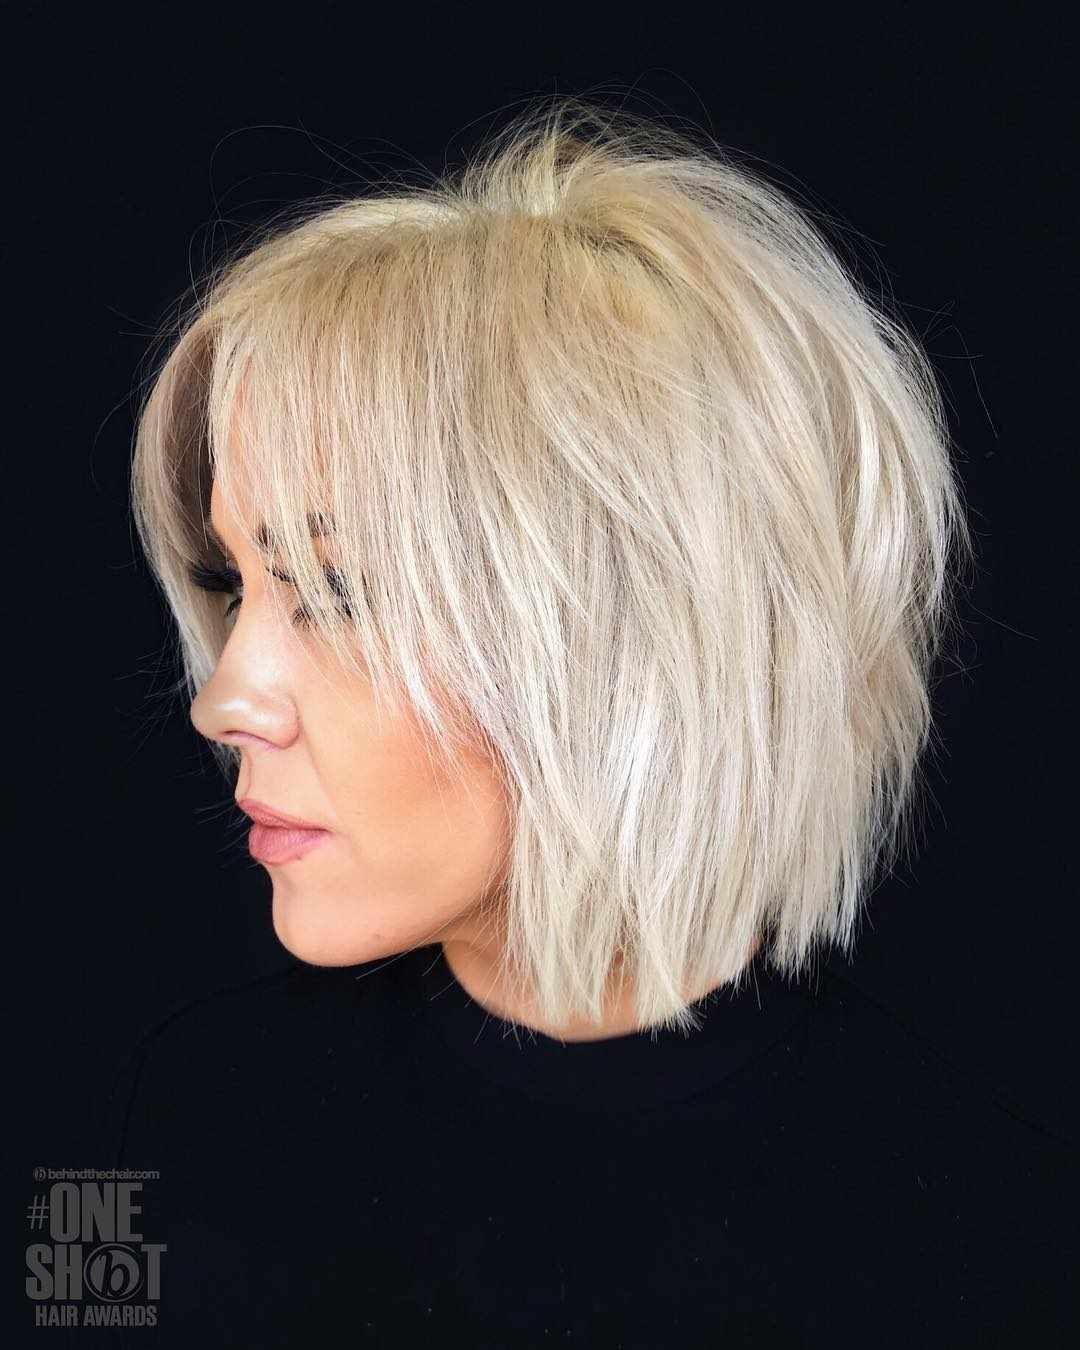 50 Best Female Haircut Style For Short Hair Bobhair Bobhaircut Hairstyle Hairstyles Pi Short Hair Haircuts Short Choppy Haircuts Short Hair With Layers